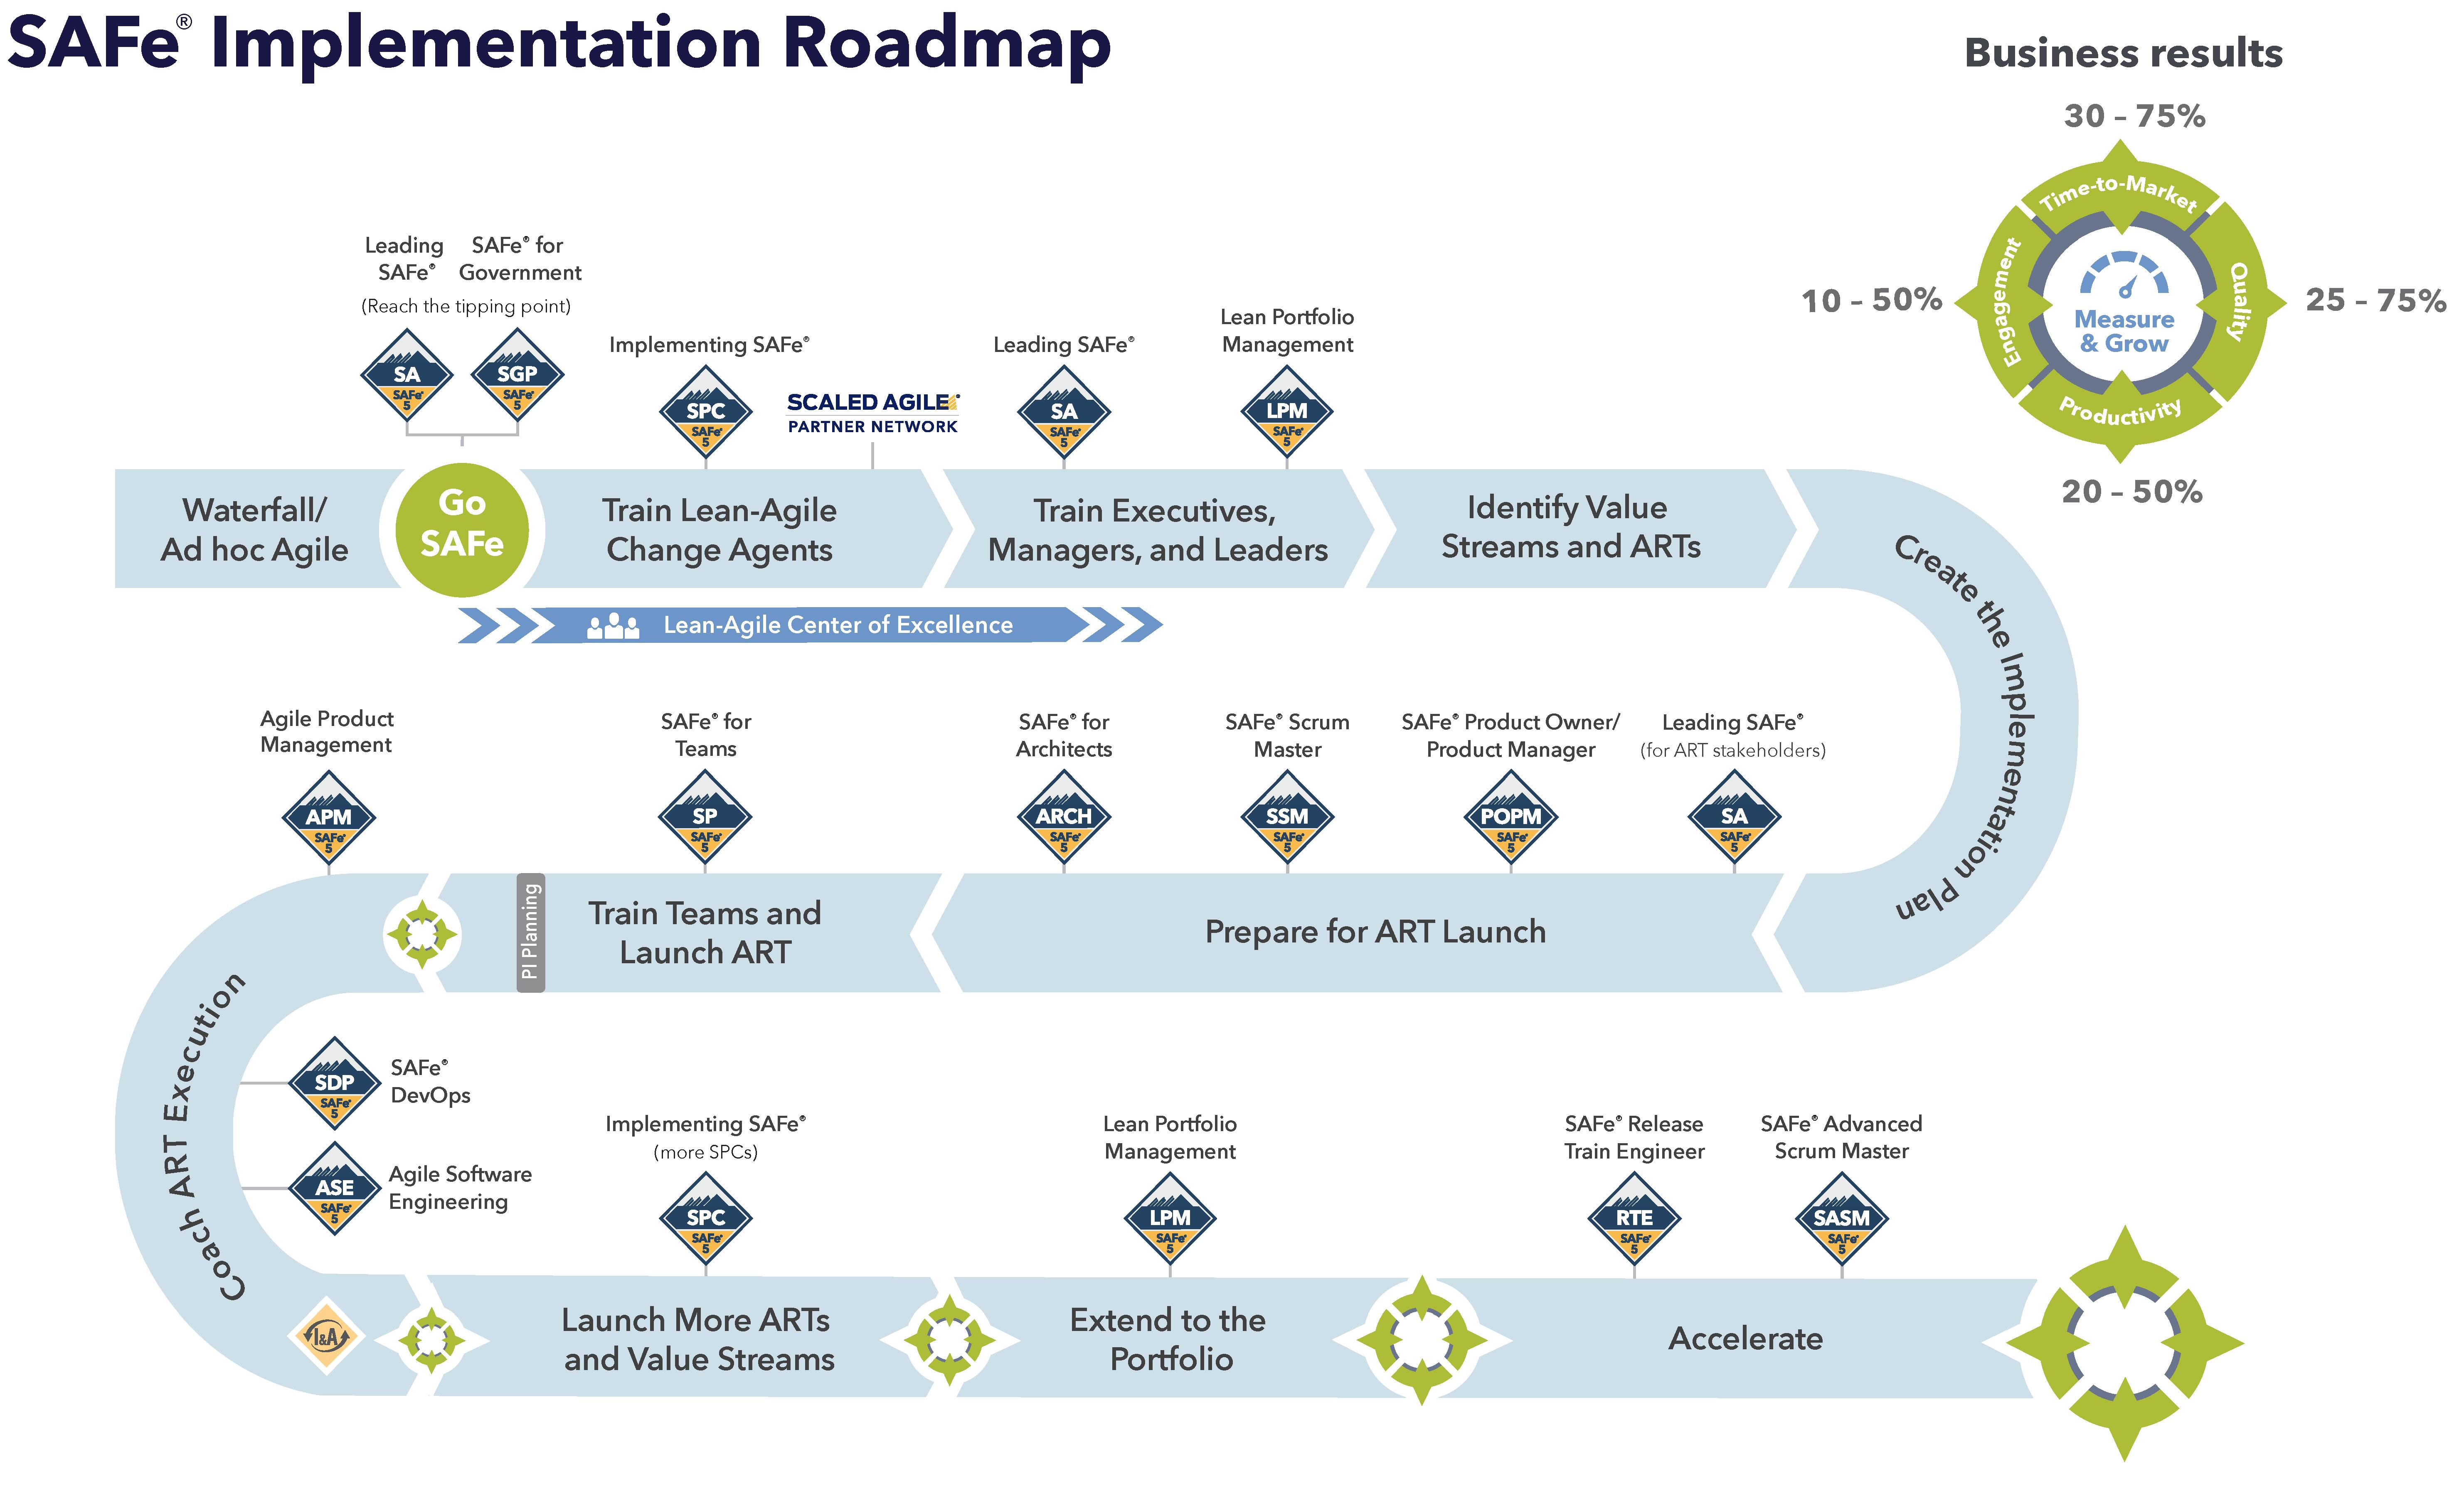 Safe Roadmap